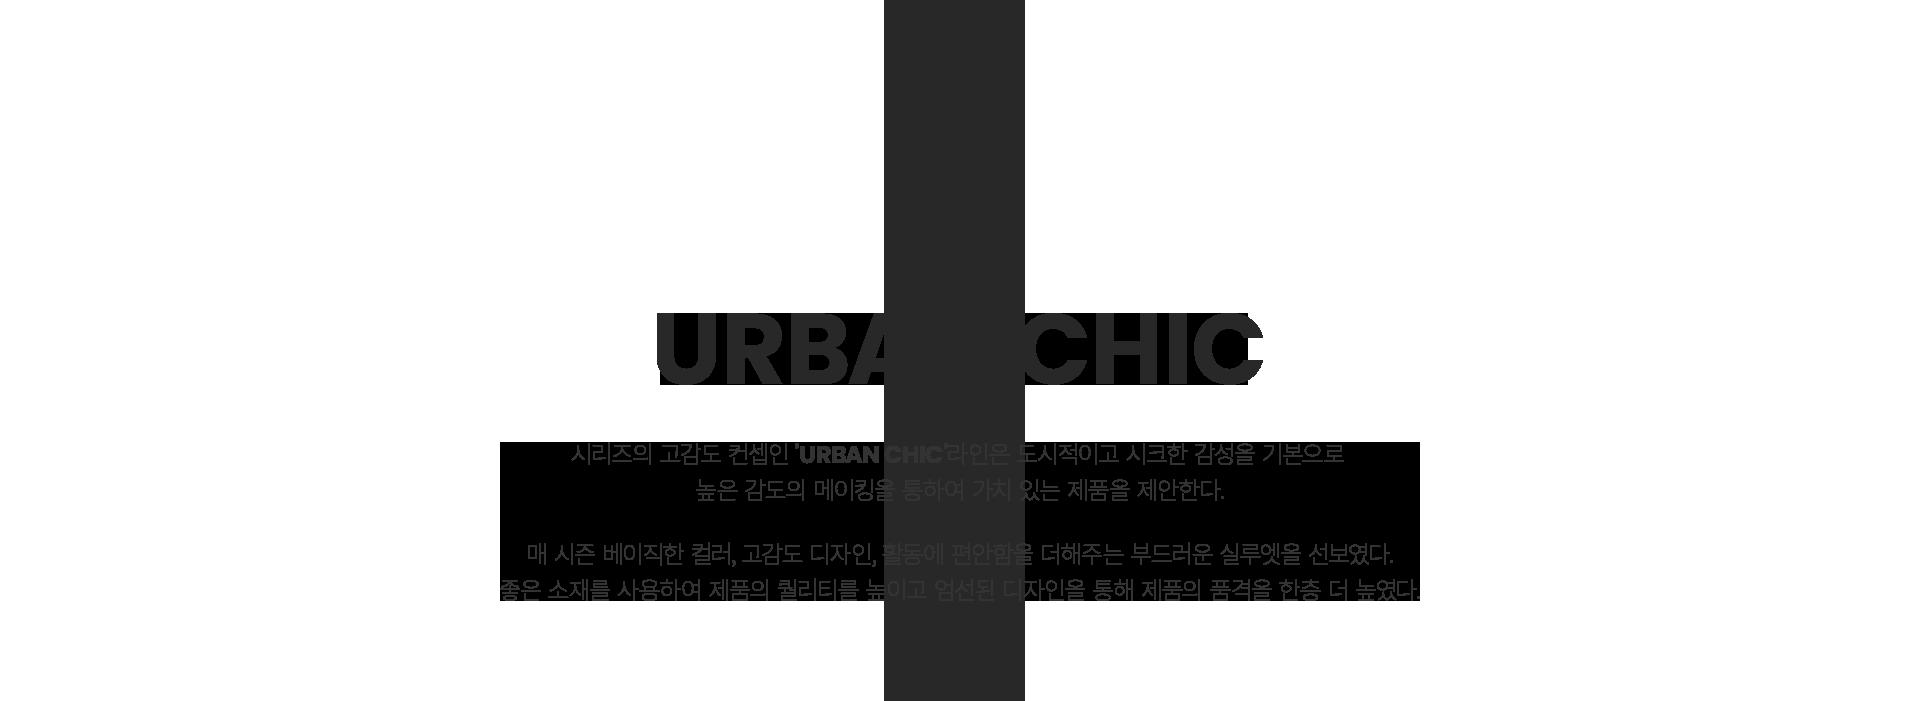 series; urban generation                                                 URBAN CHIC                                                 시리즈의 고감도 컨셉인 `URNBAN CHIC`라인은 도시적이고 시크한 감성을 기본으로 높은 감도의 메이킹을 통하여 가치 있는 제품을 제안한다.                                                 매 시즌 베이직한 컬러, 고감도 디자인, 활동에 편안함을 더해주는 부드러운 실루엣을 선보였다.                                                 좋은 소재를 사용하여 제품의 퀄리티를 높이고 엄선된 디자인을 통해 제품의 품격을 한층 더 높였다.